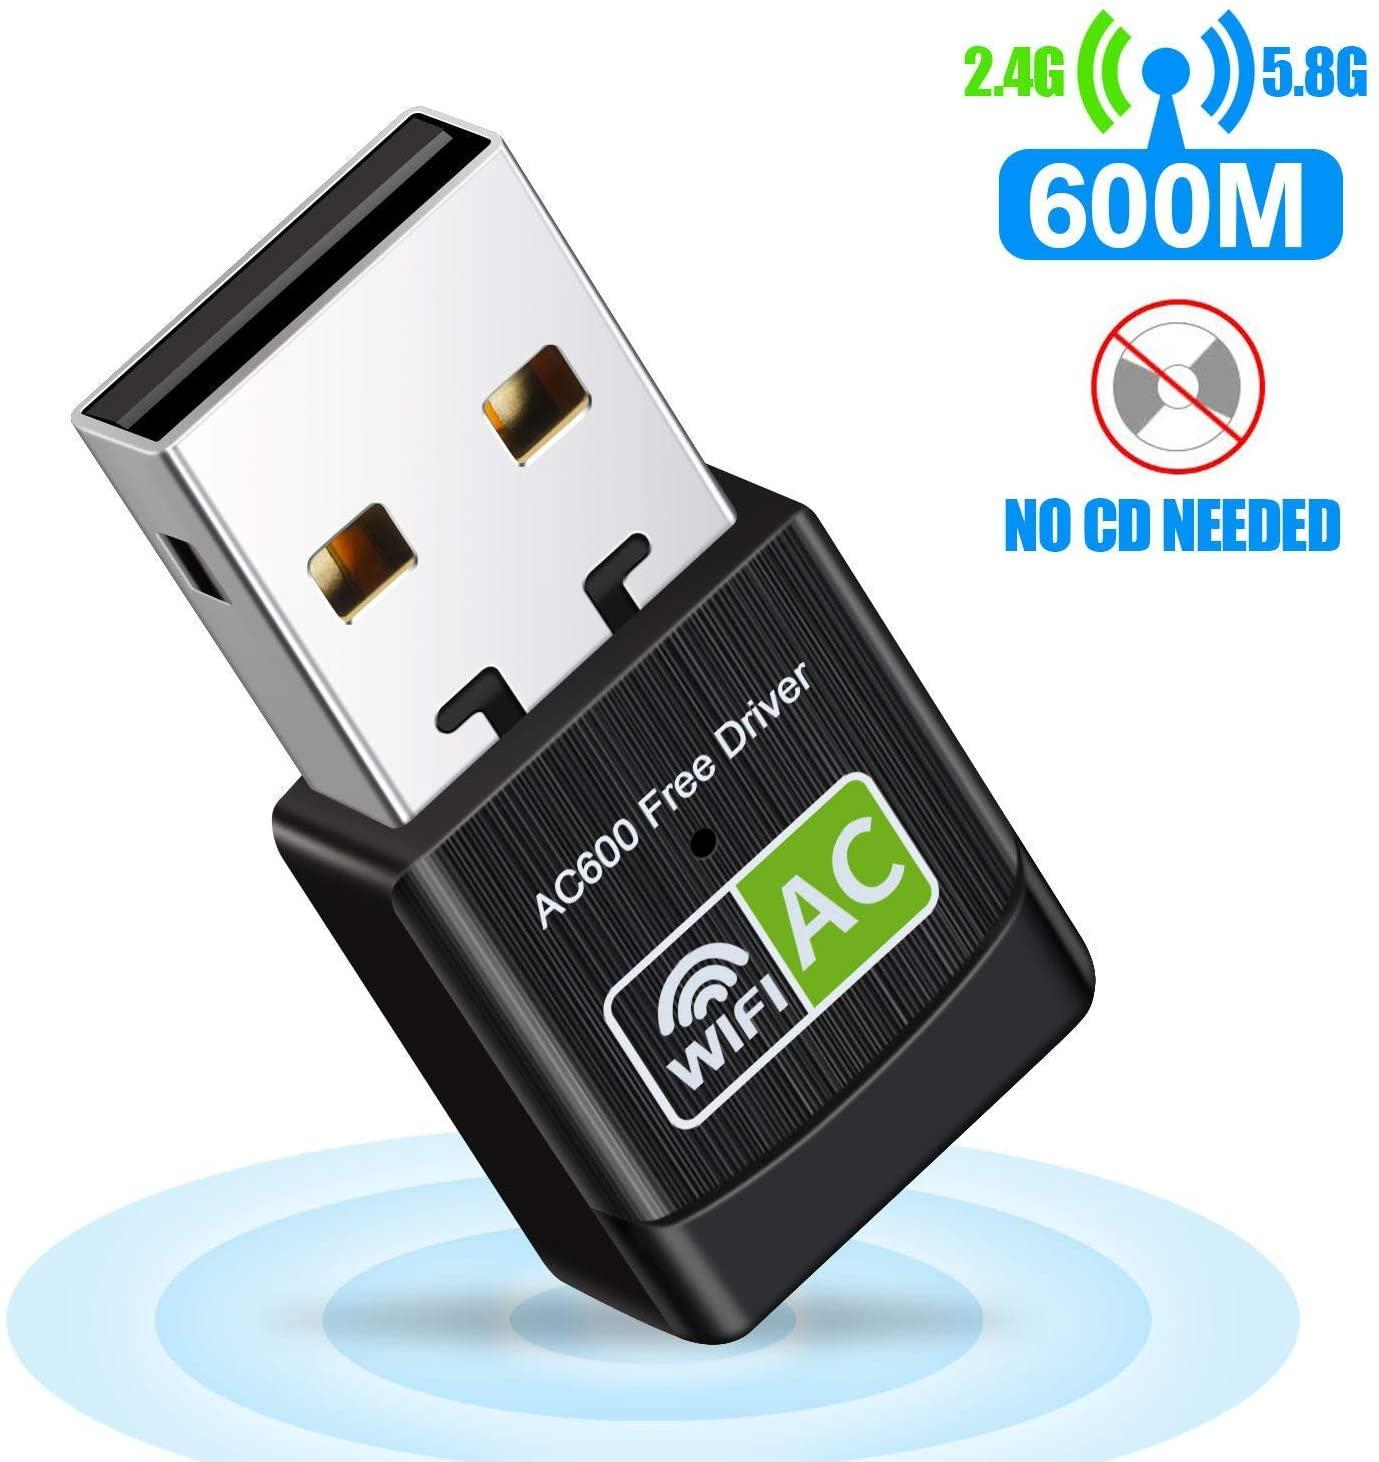 WiFi Dongle,USB WiFi Adapter USB Ethernet WiFi Dongle 600Mbps 5Ghz LAN USB Wi-Fi Adapter PC Antena Wi Fi Receiver AC Wireless Network Card